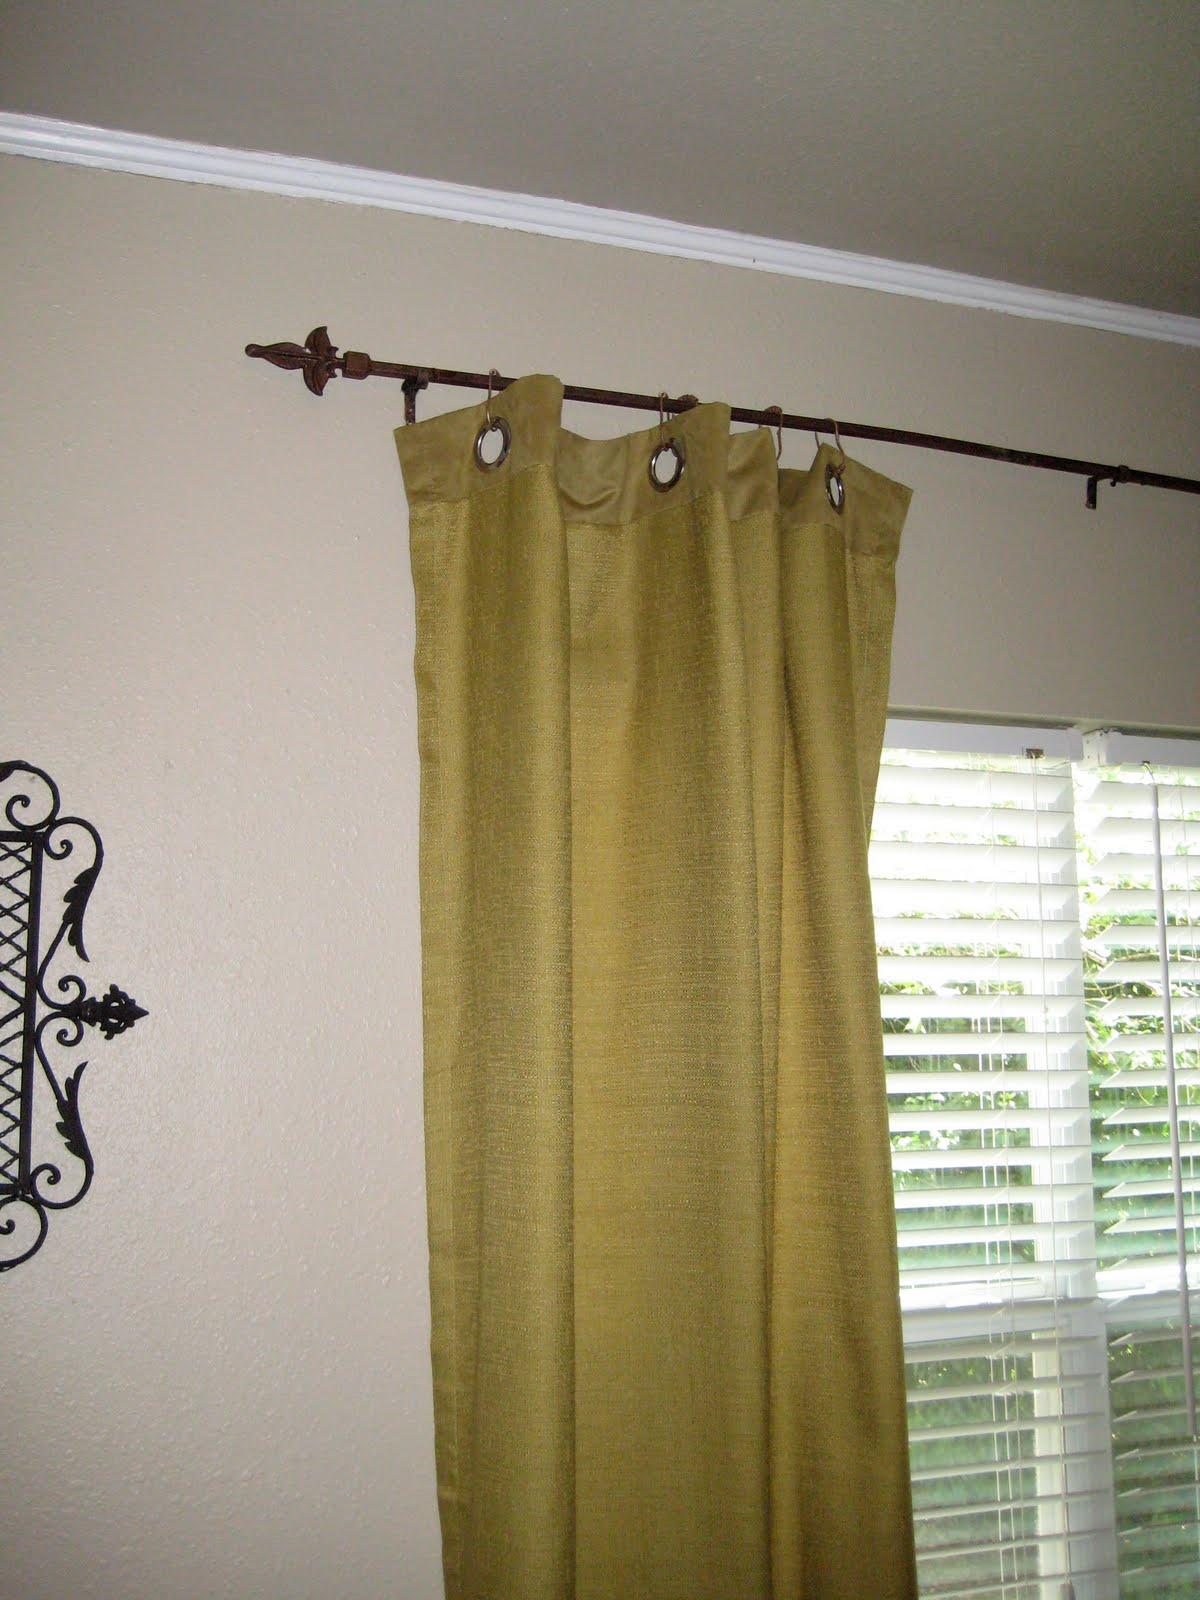 9.SIMPHOME.COM A Welded Fence Rail Curtain Rod Project Idea